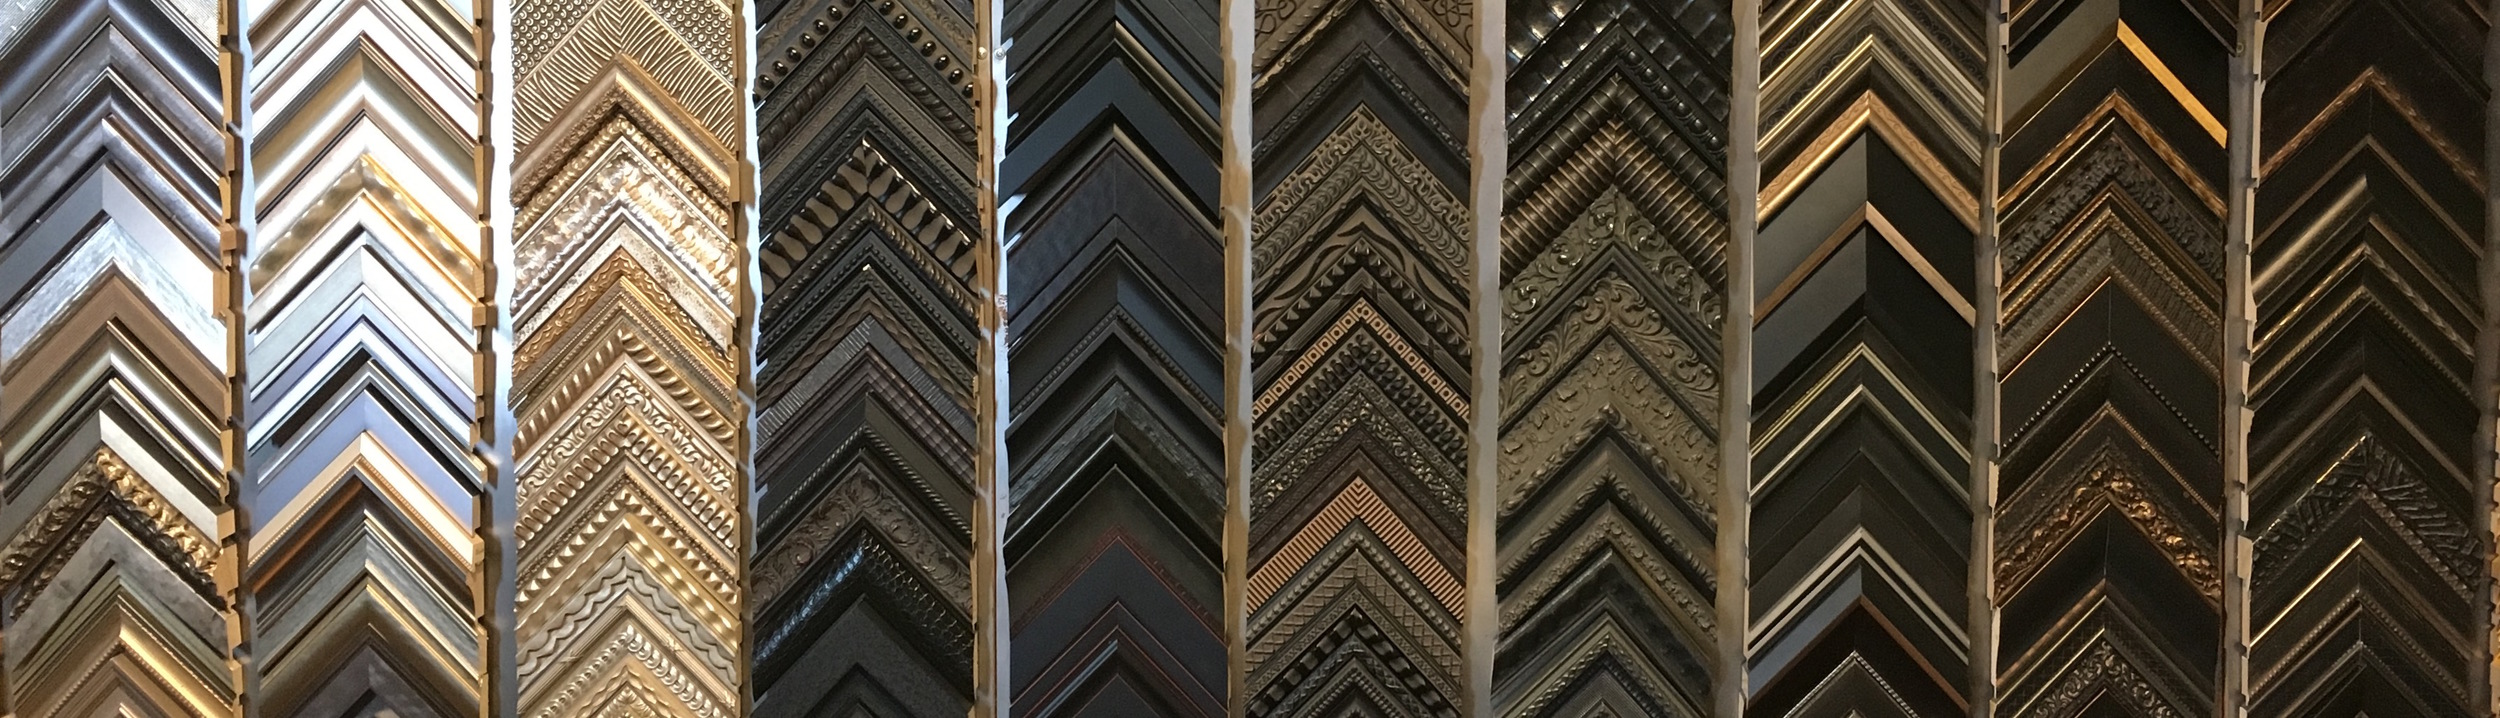 callahan-framing-custom-moulding-wall.JPG